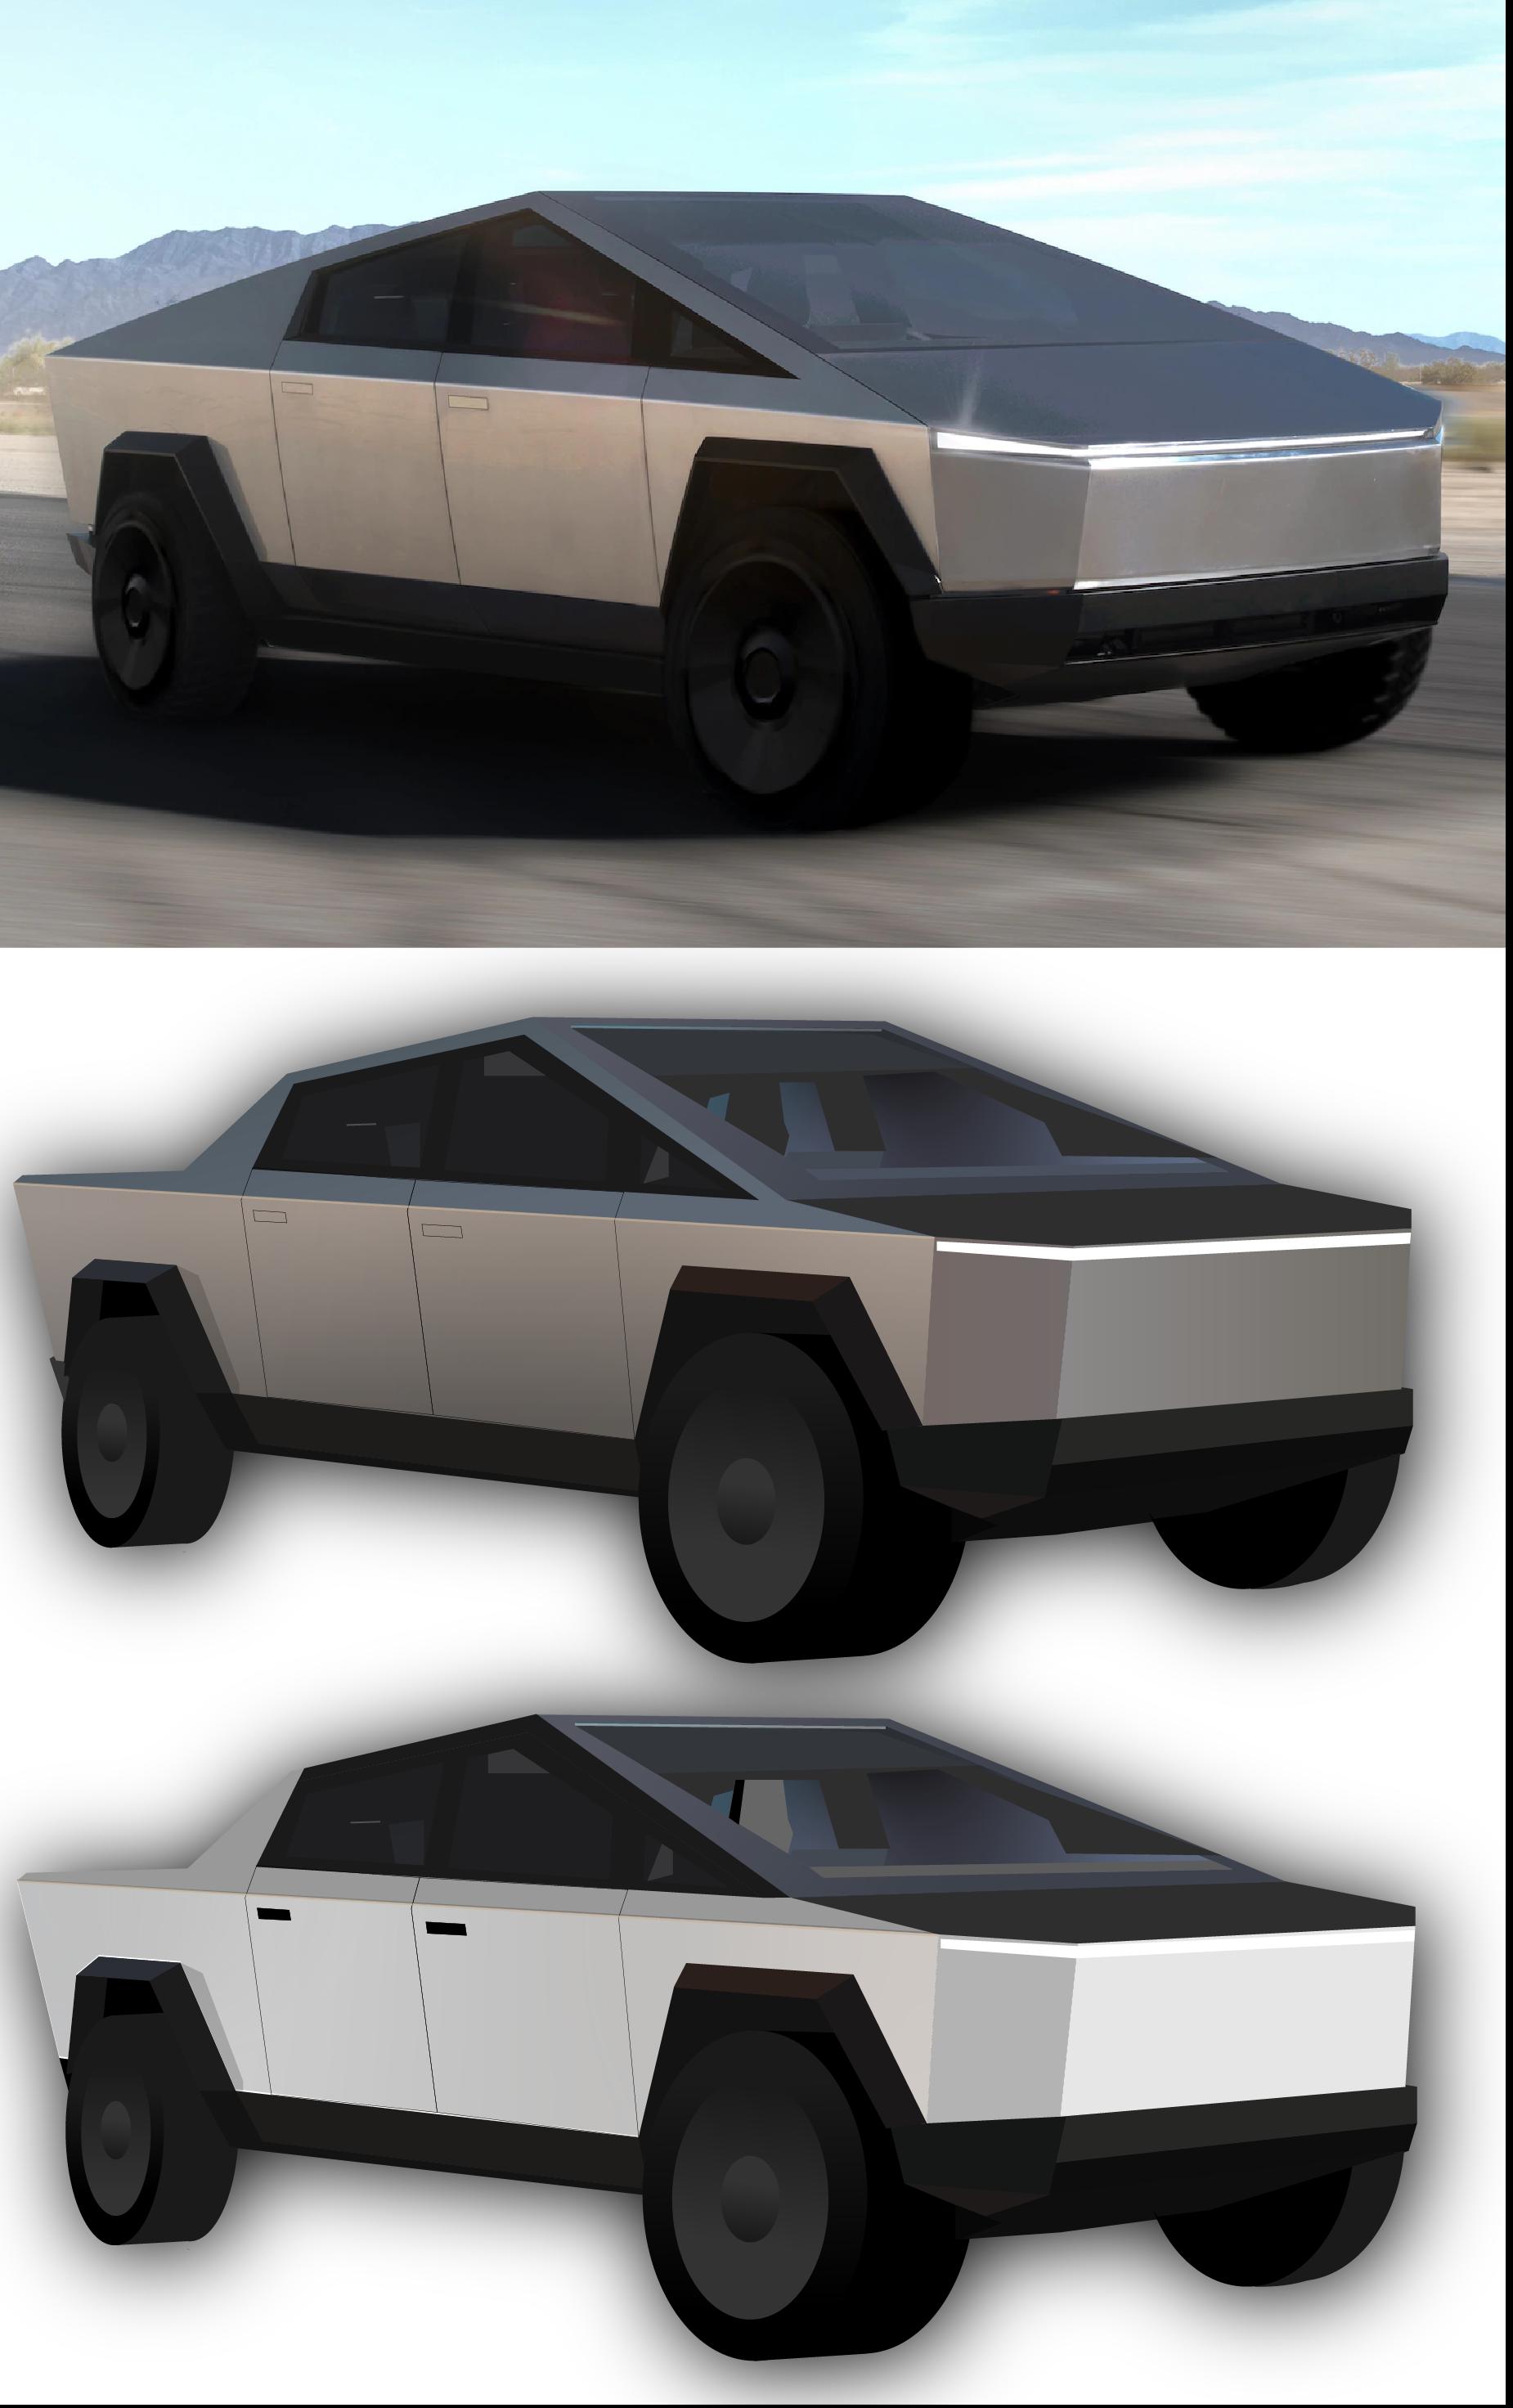 I Redesigned The Cybertruck For Fun Using Adobe Illustrator Tesla Trucks New Trucks